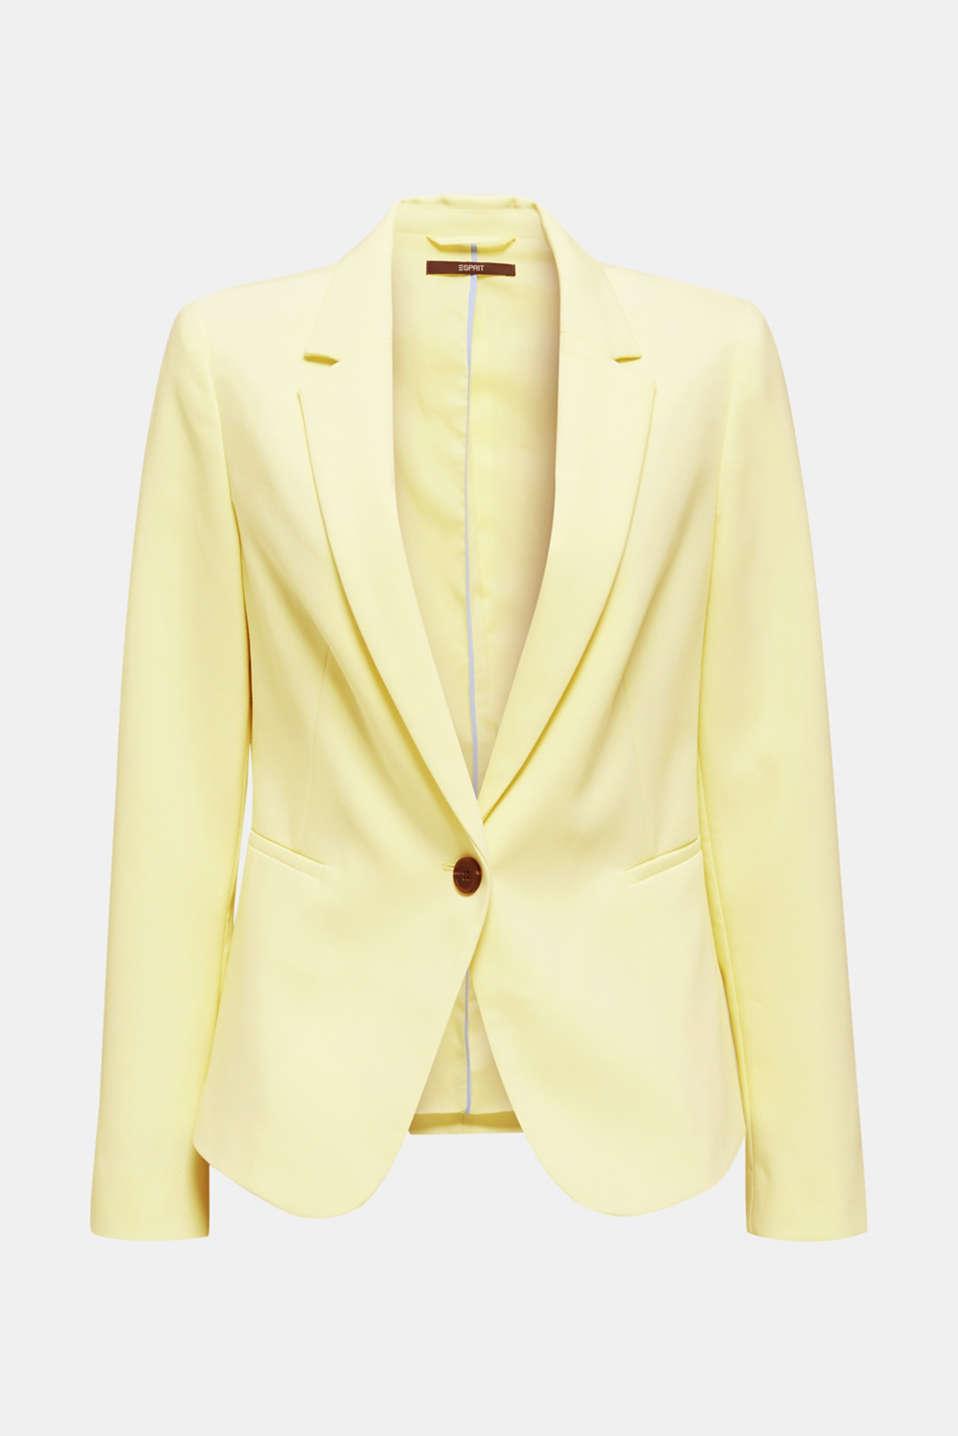 SUMMER BIZ mix + match blazer, LIME YELLOW, detail image number 6